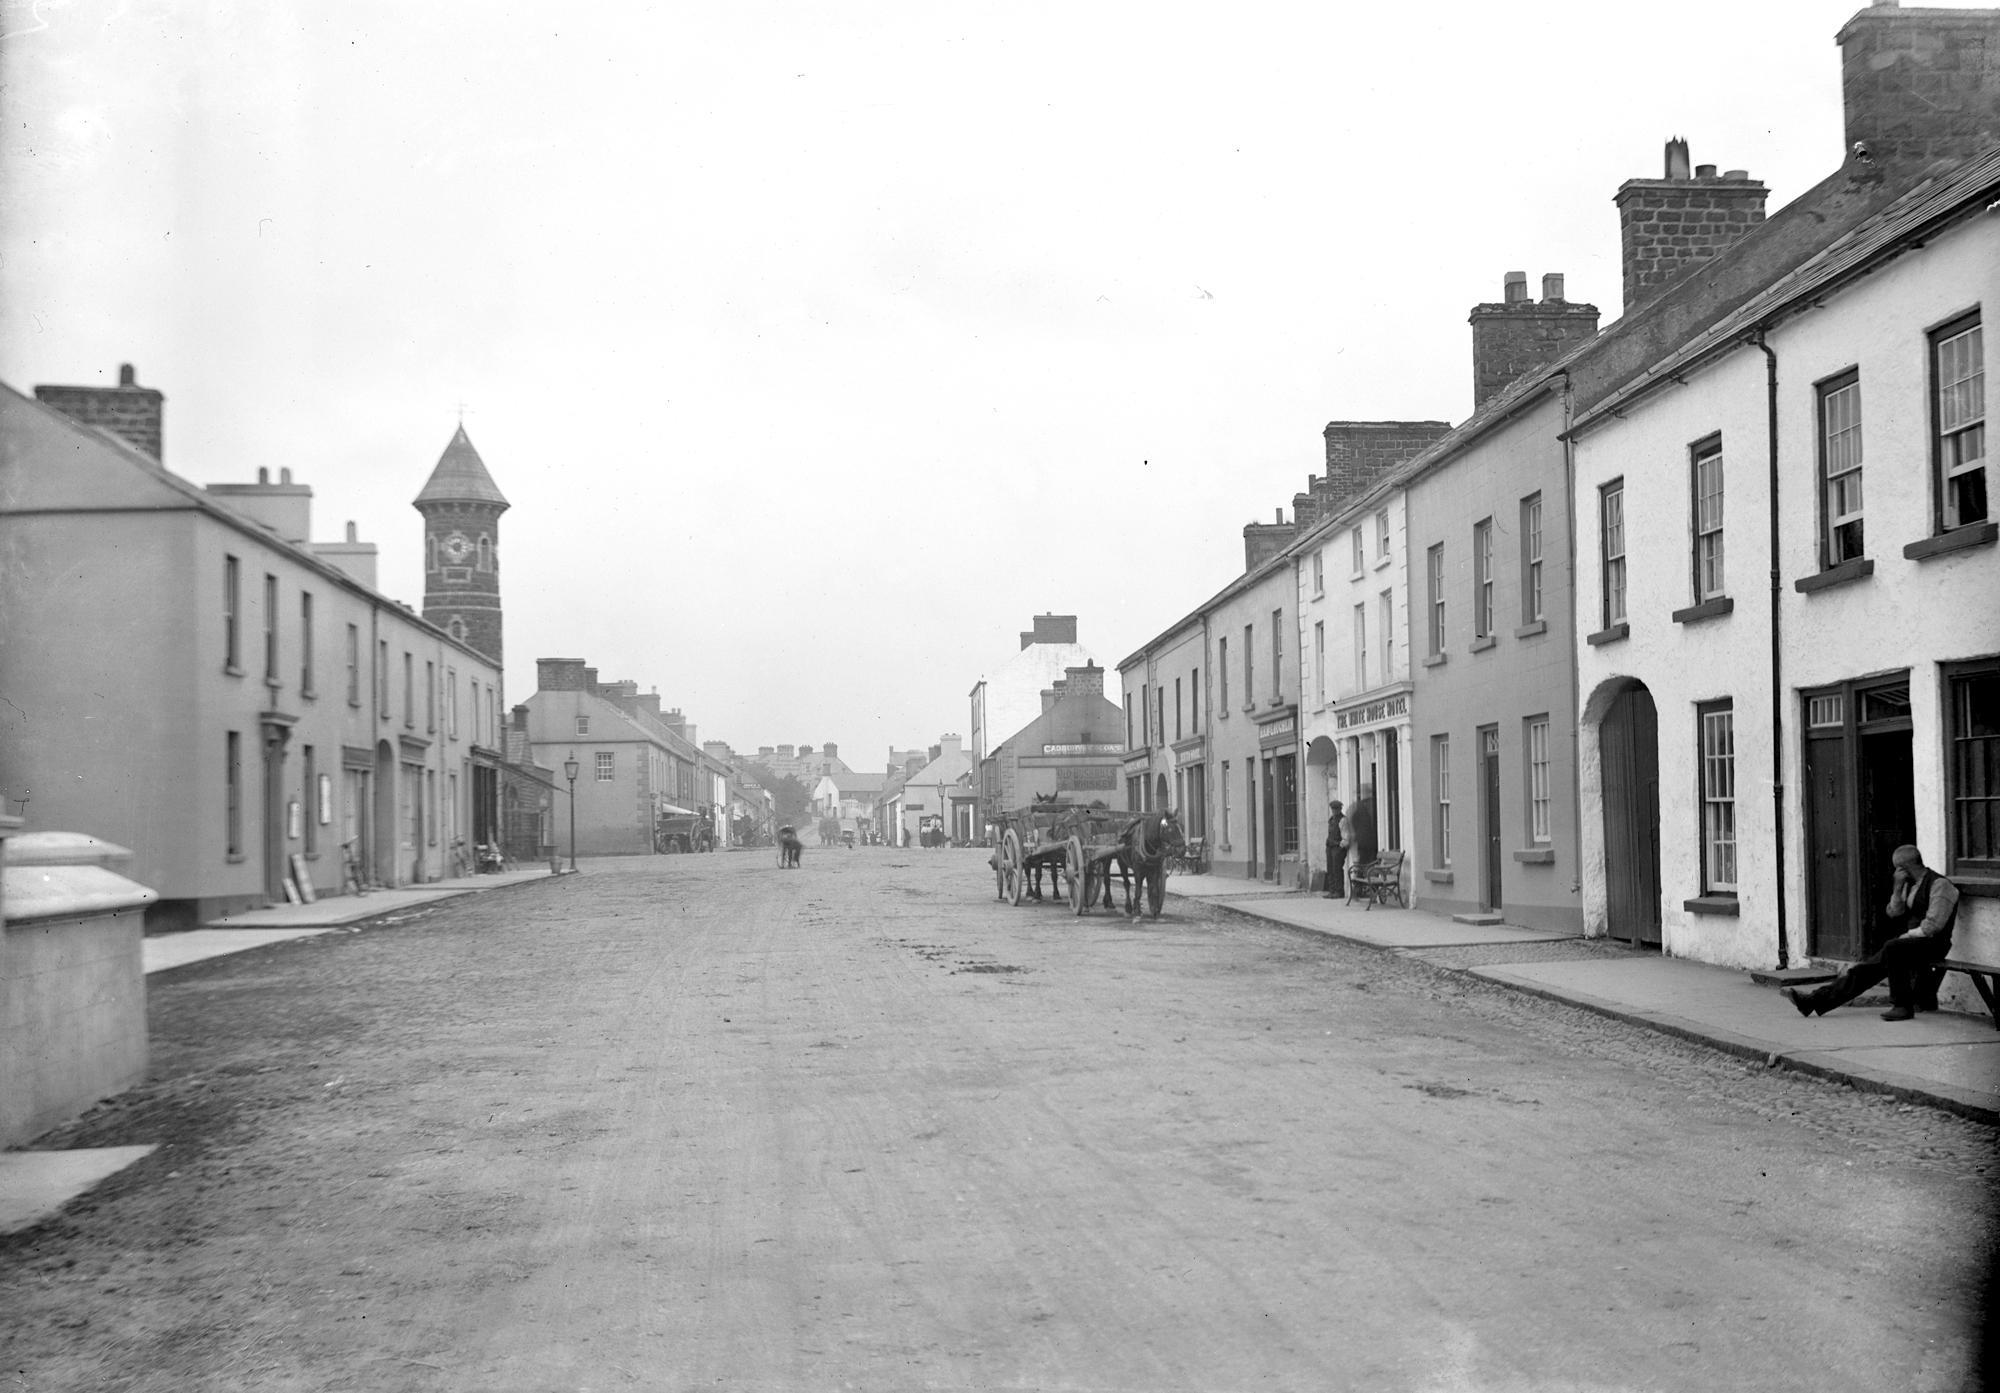 Street in Bushmills, Co. Antrim